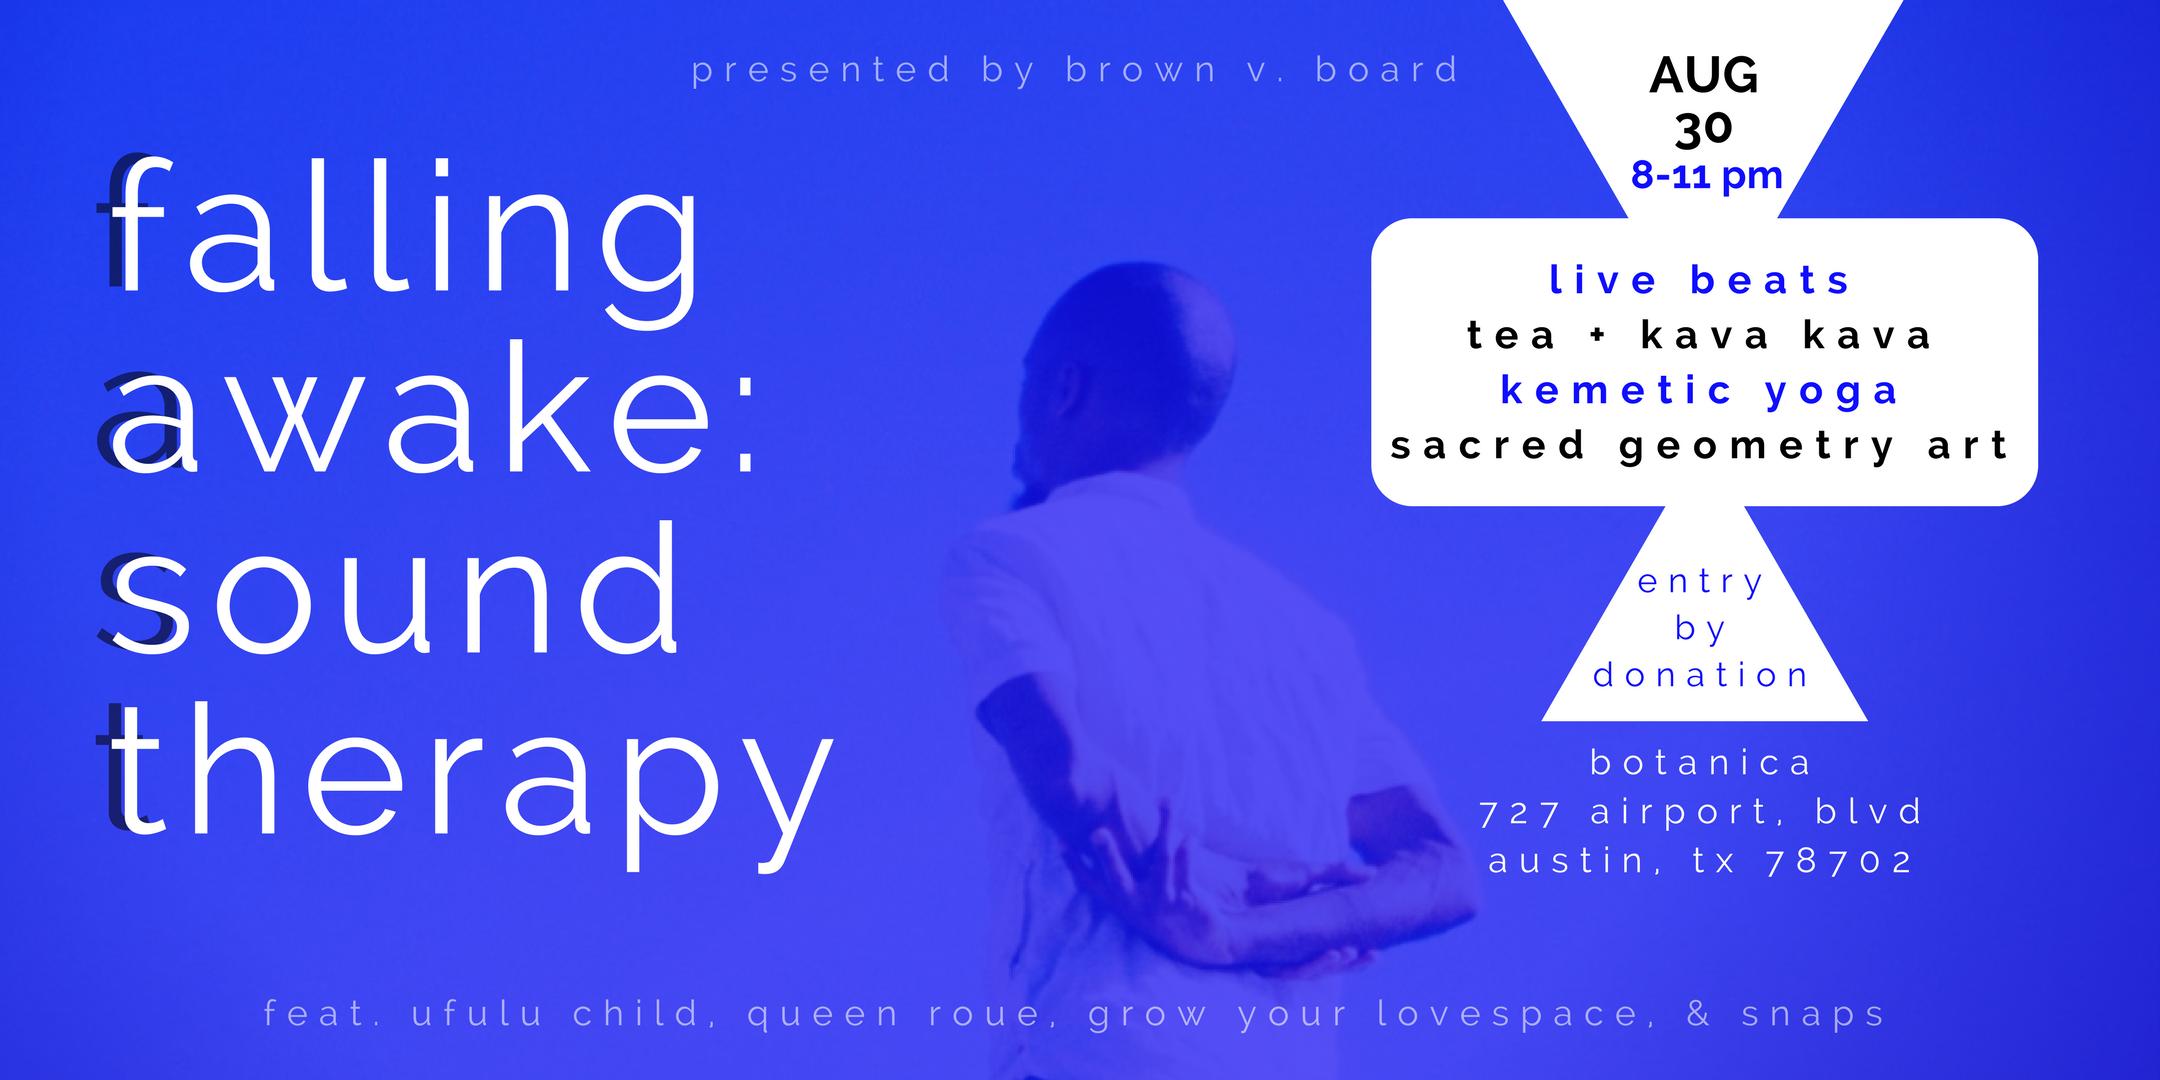 Falling Awake: Sound Therapy flyer